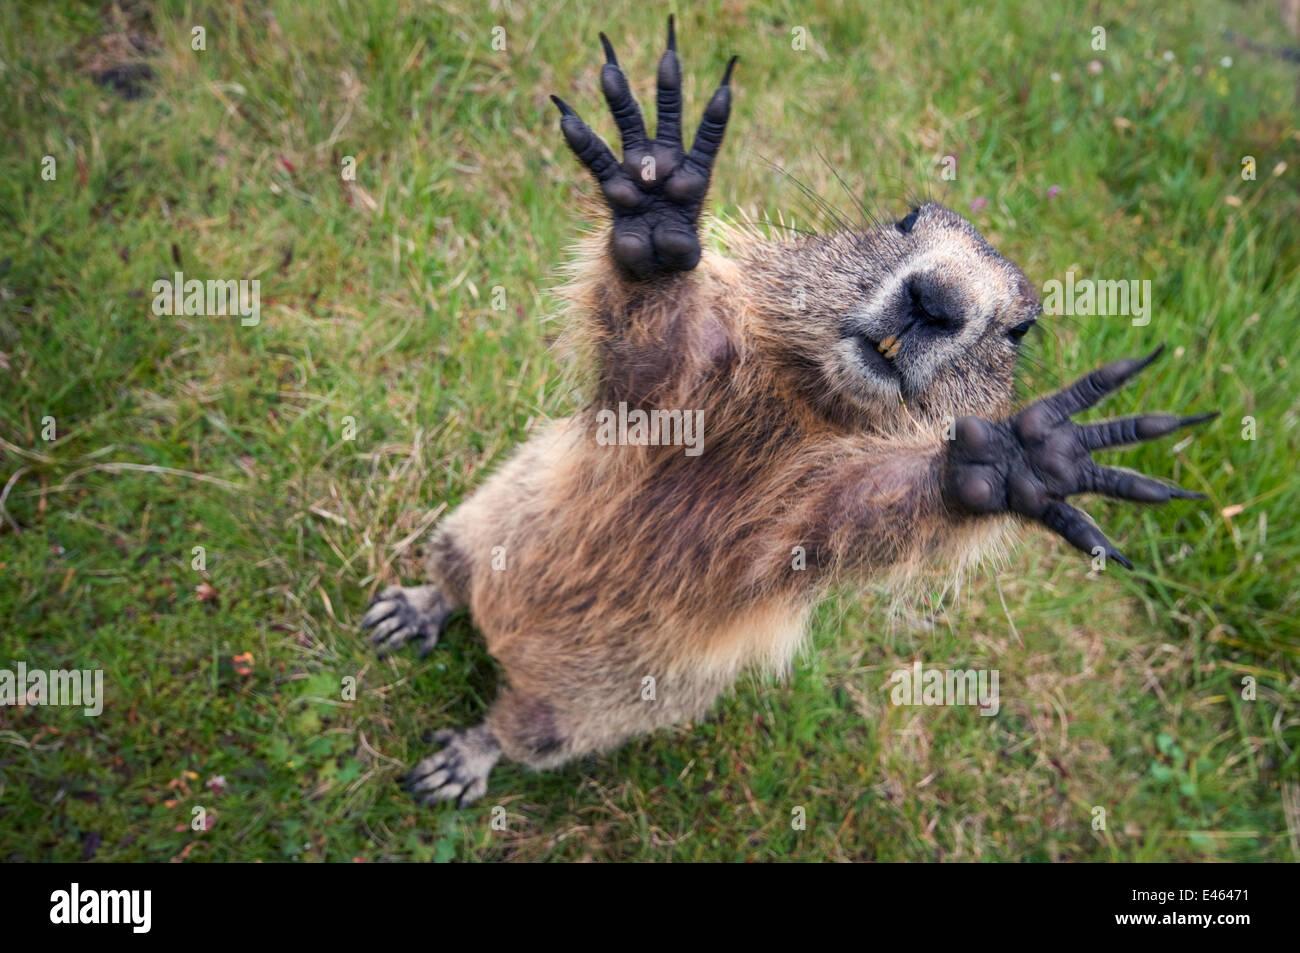 handsAlpine marmot (Marmota marmota) reching upwards, Hohe Tauern National Park, Austria, July - Stock Image